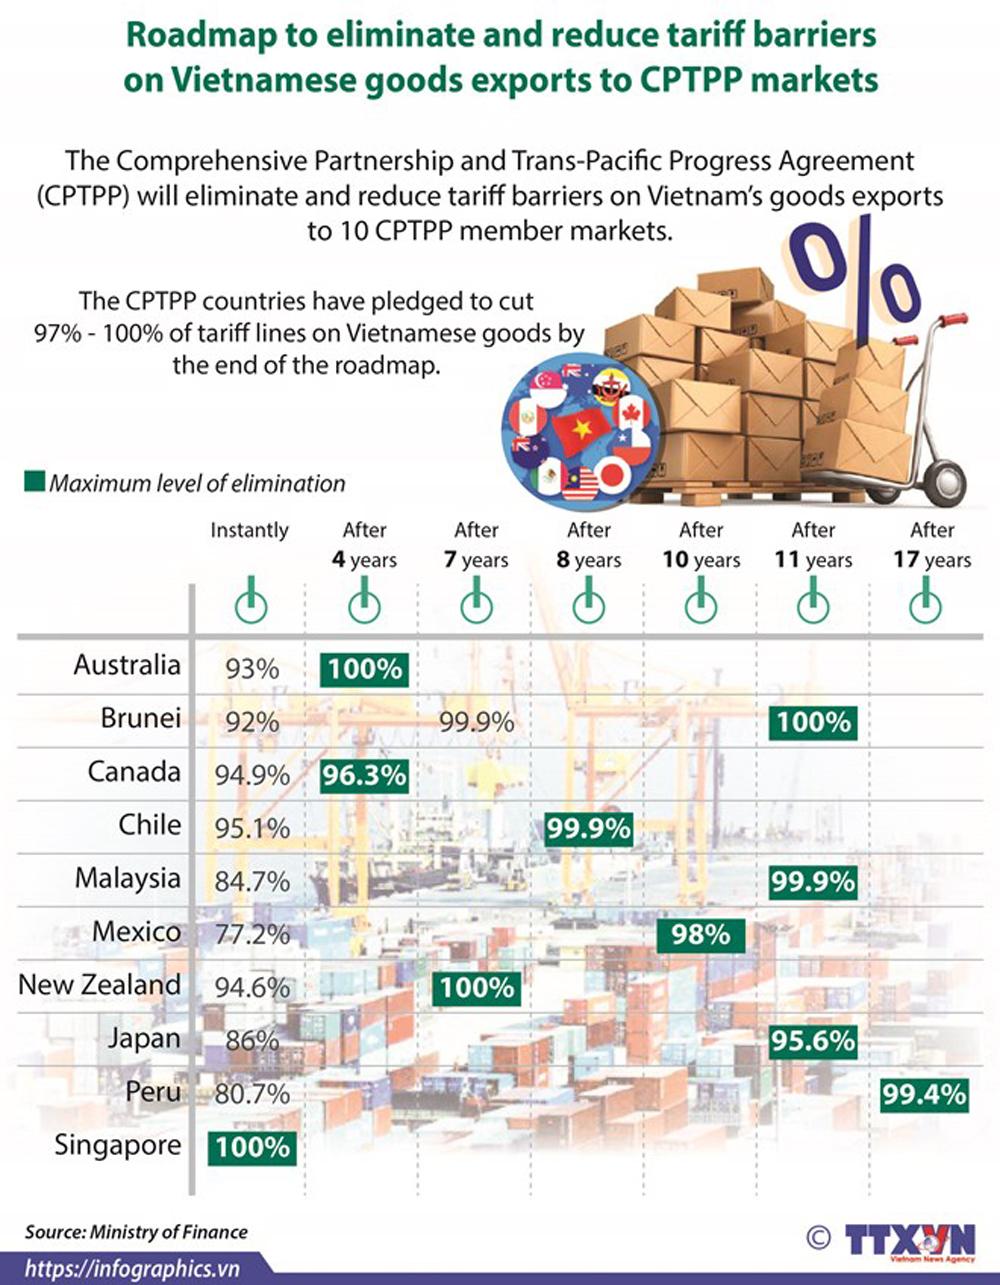 Roadmap, tariff barriers, Vietnamese goods, CPTPP. Vietnam